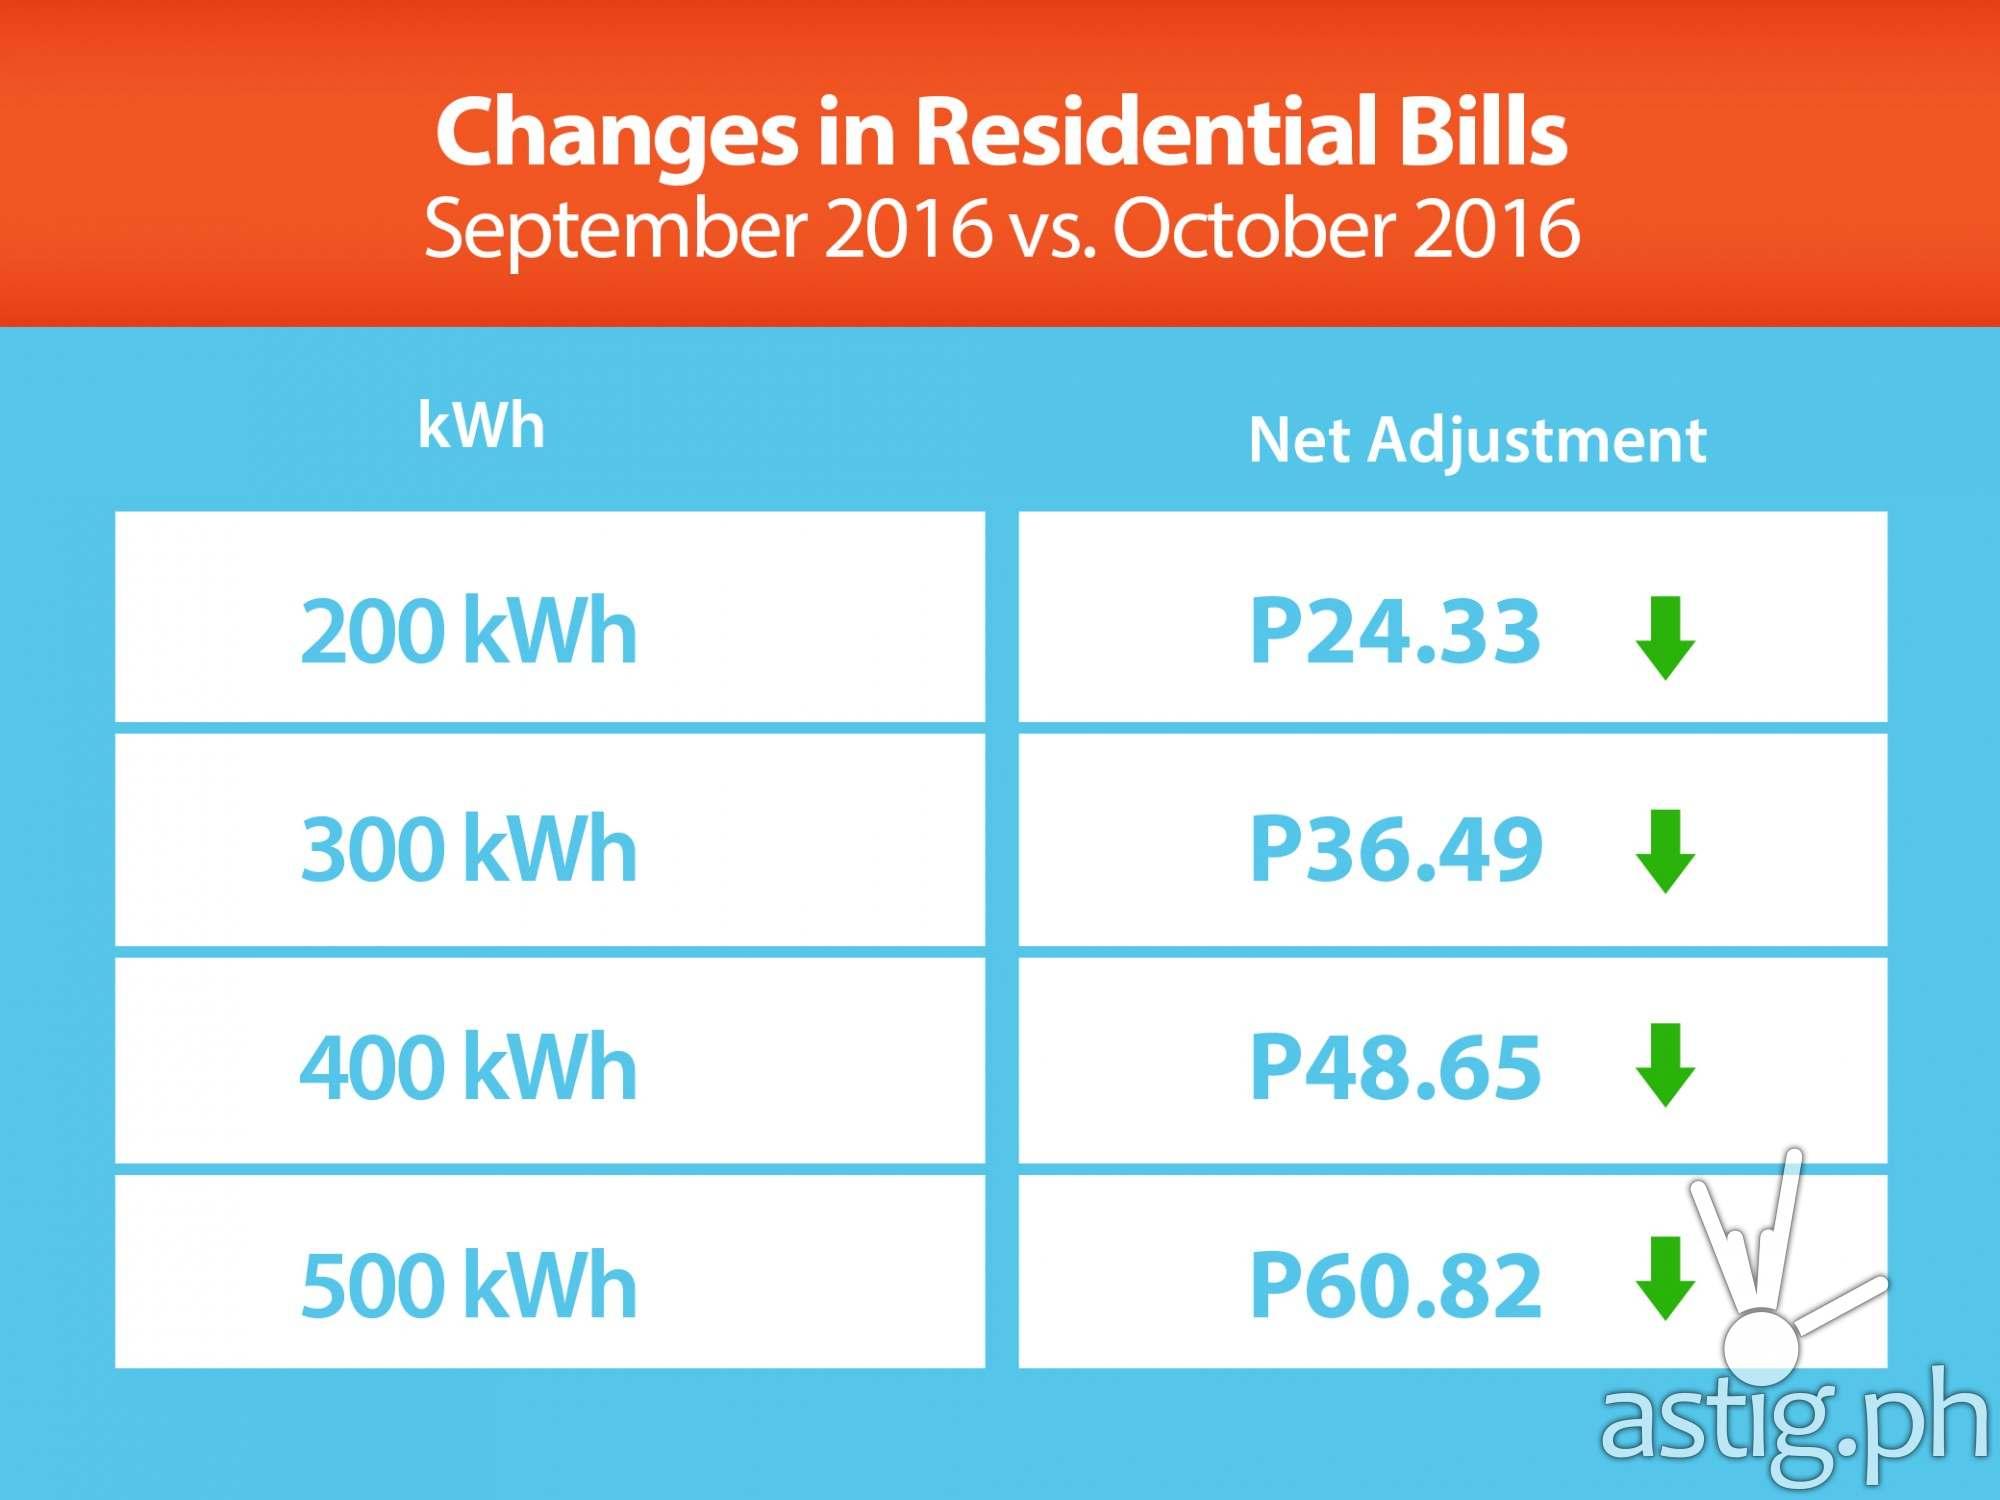 Changes in Residential Bills